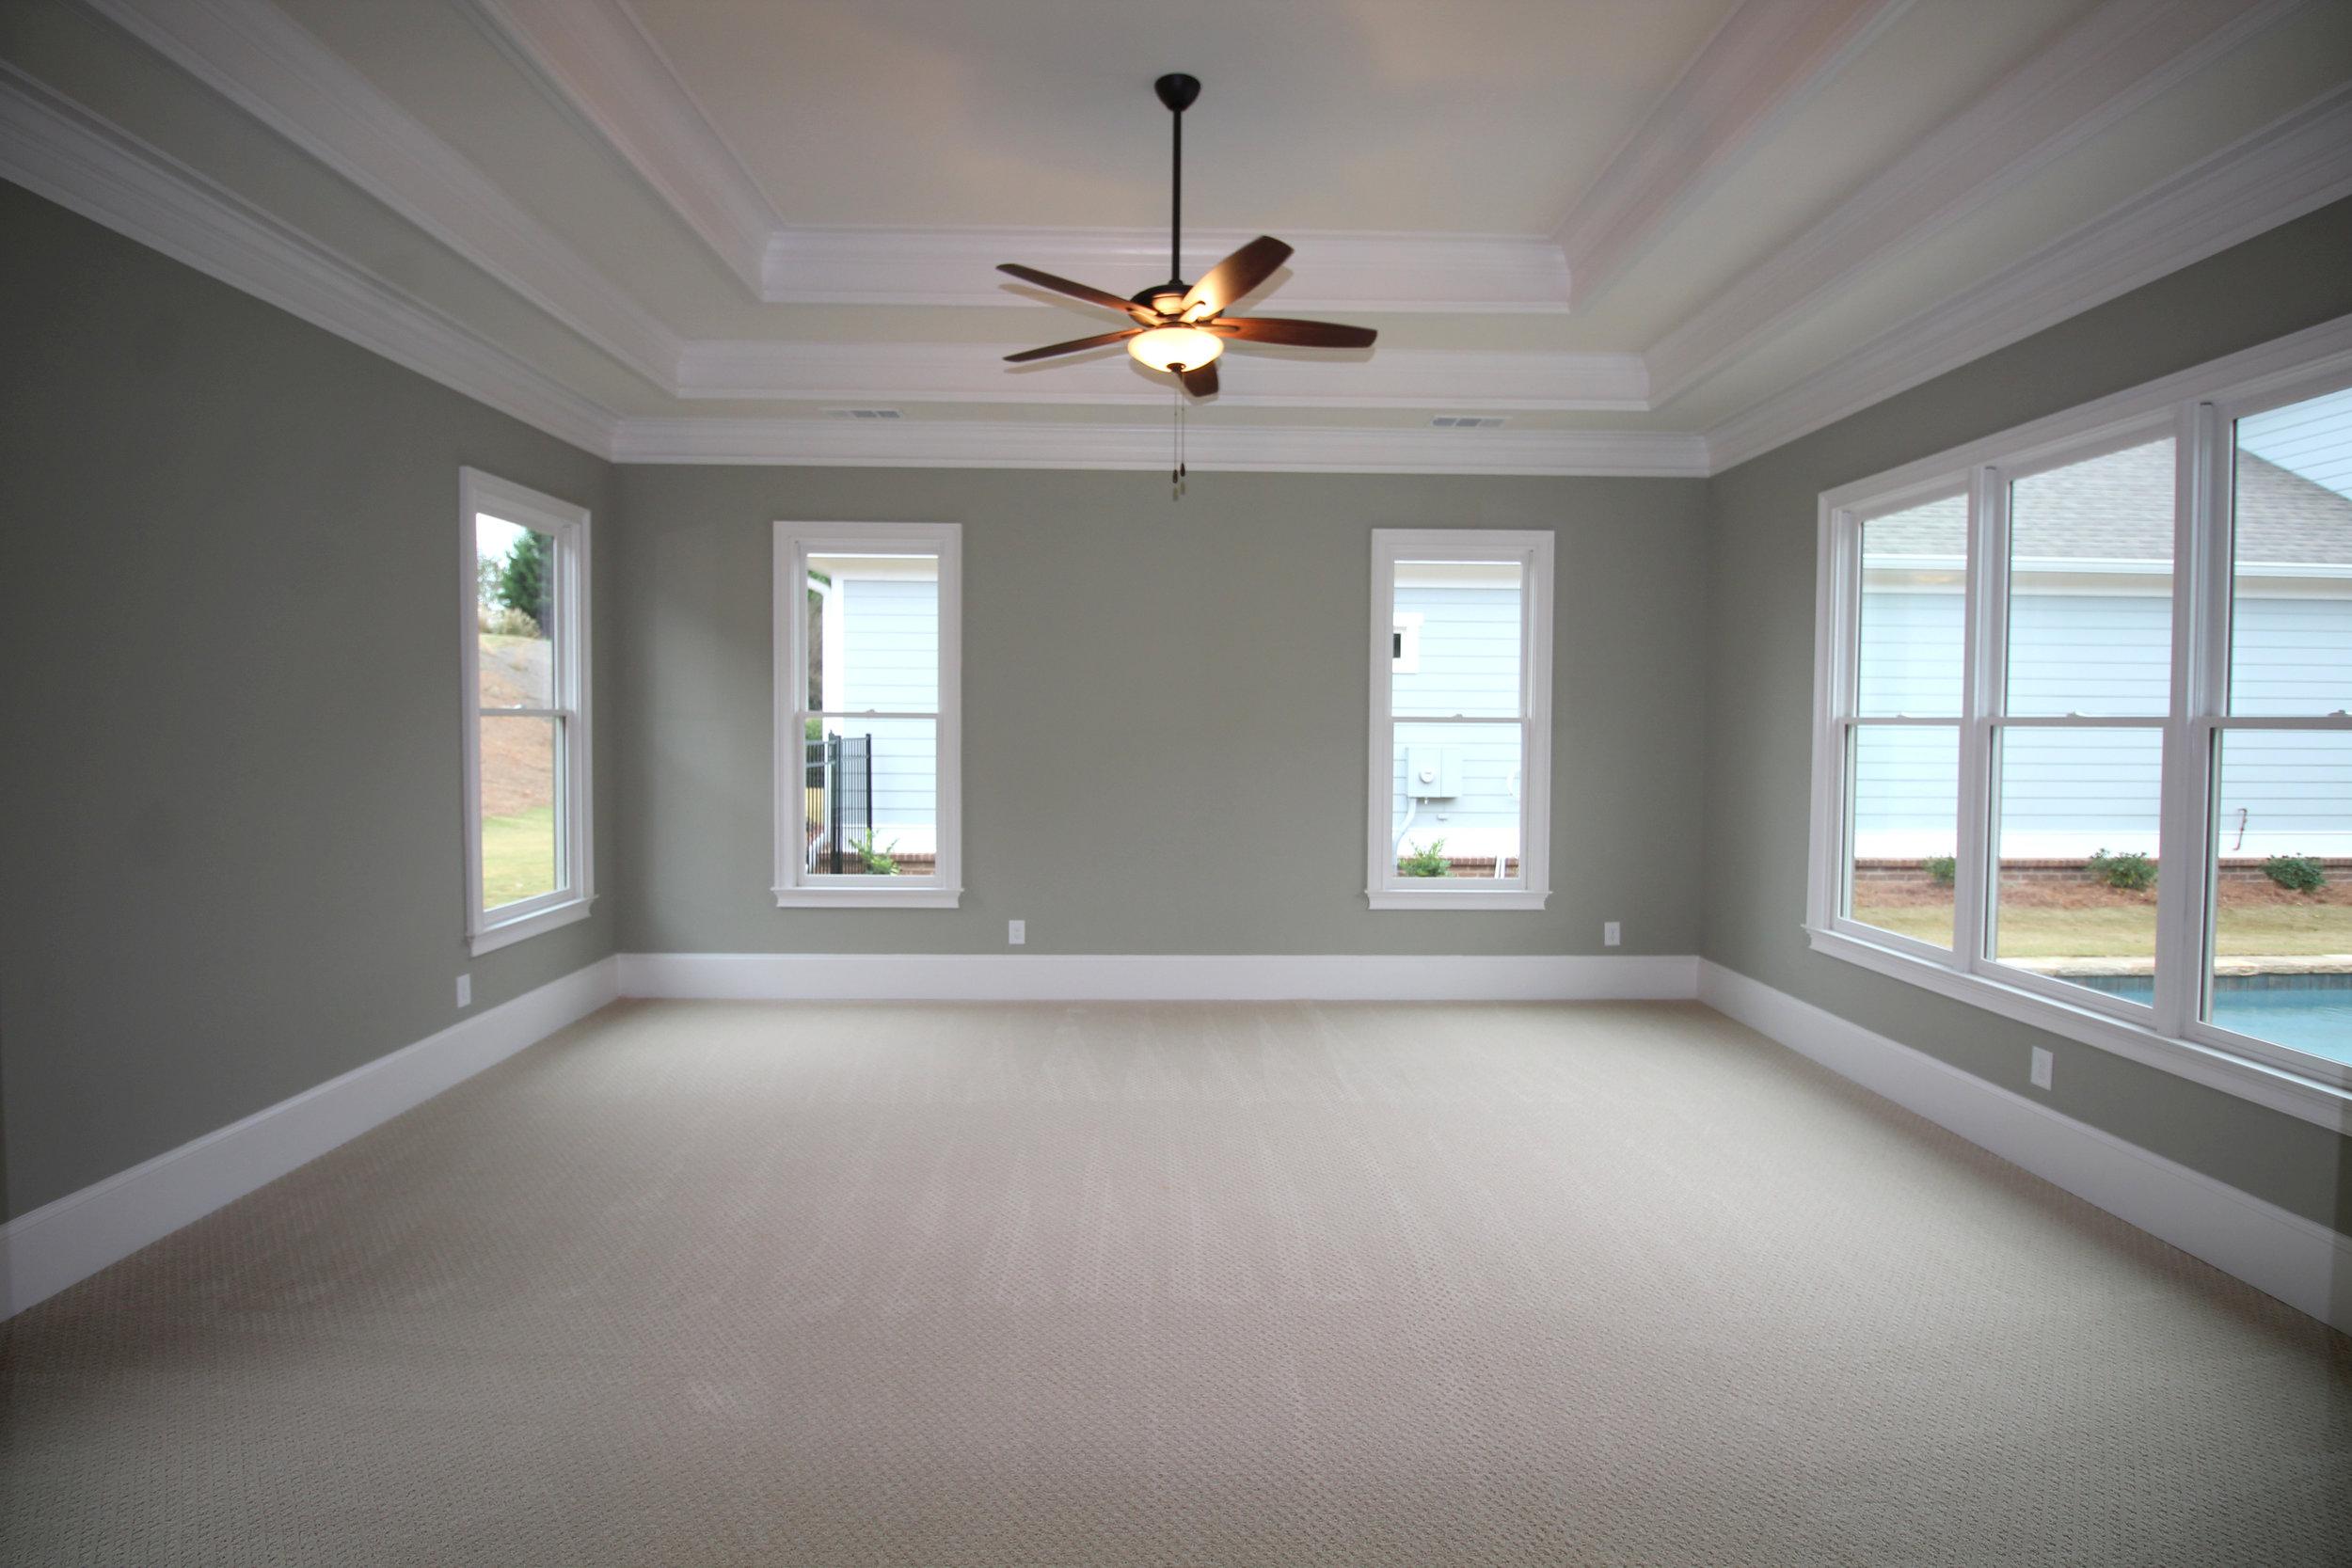 berber-carpet-master-bedroom-1756-greenleffe-drive-statham-ga-30666-the-georgia-club-oconee-county-oconee-springs-athens-area-home-for-sale-courtyard-homes.JPG